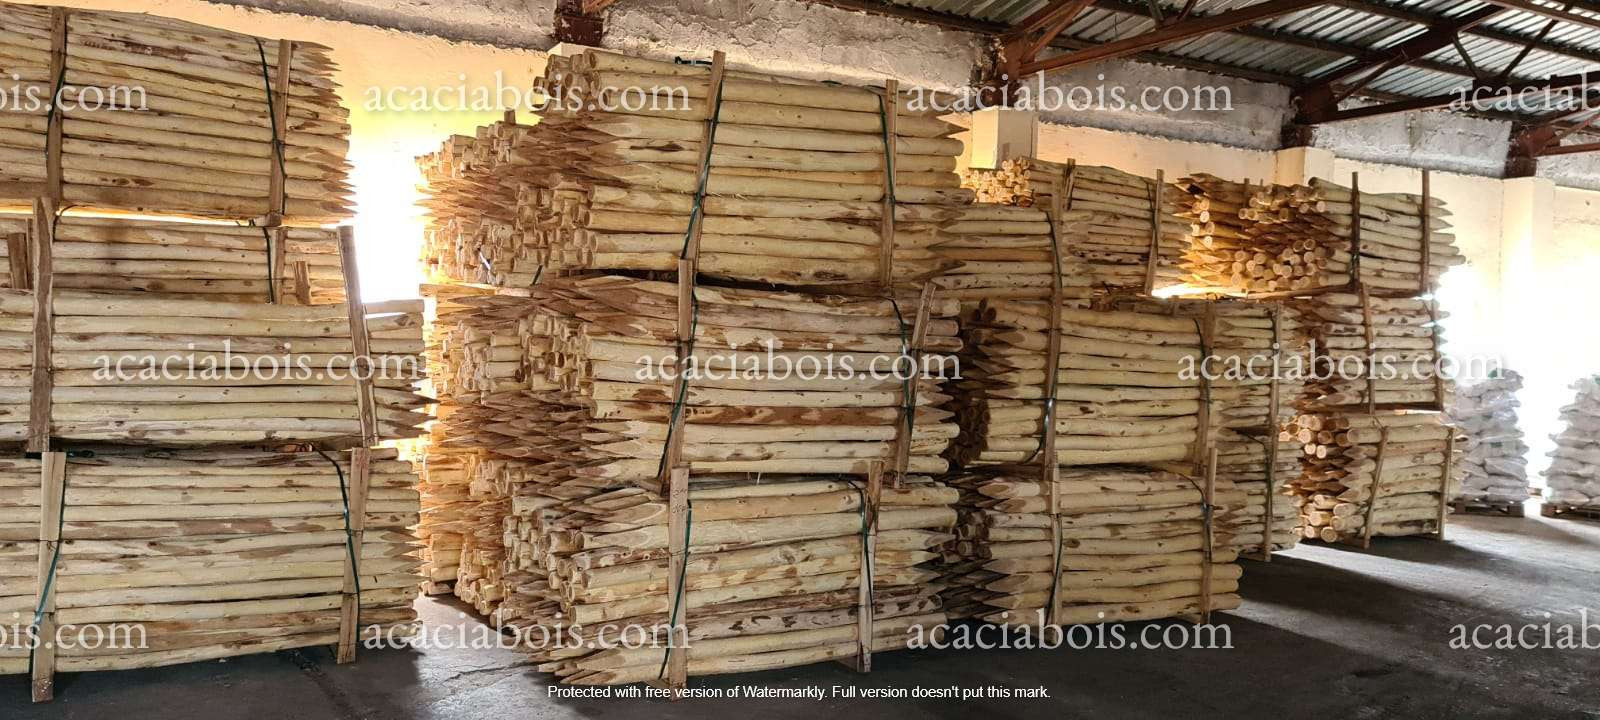 Stock_piquets_acacia.jpg